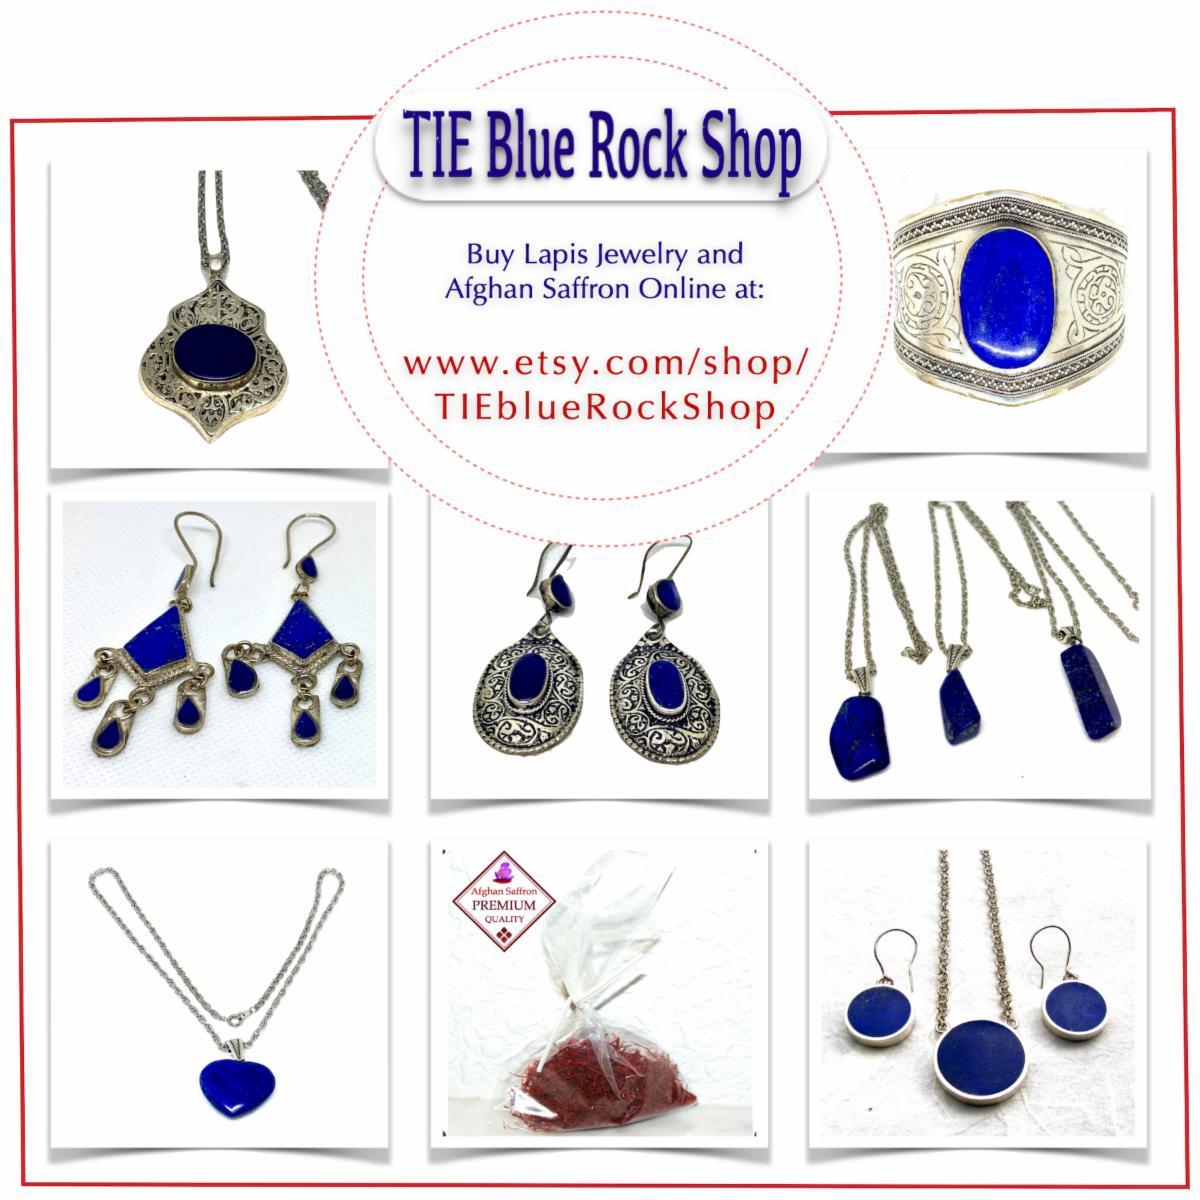 www.Etsy.com/shop/tieBlueRockShop